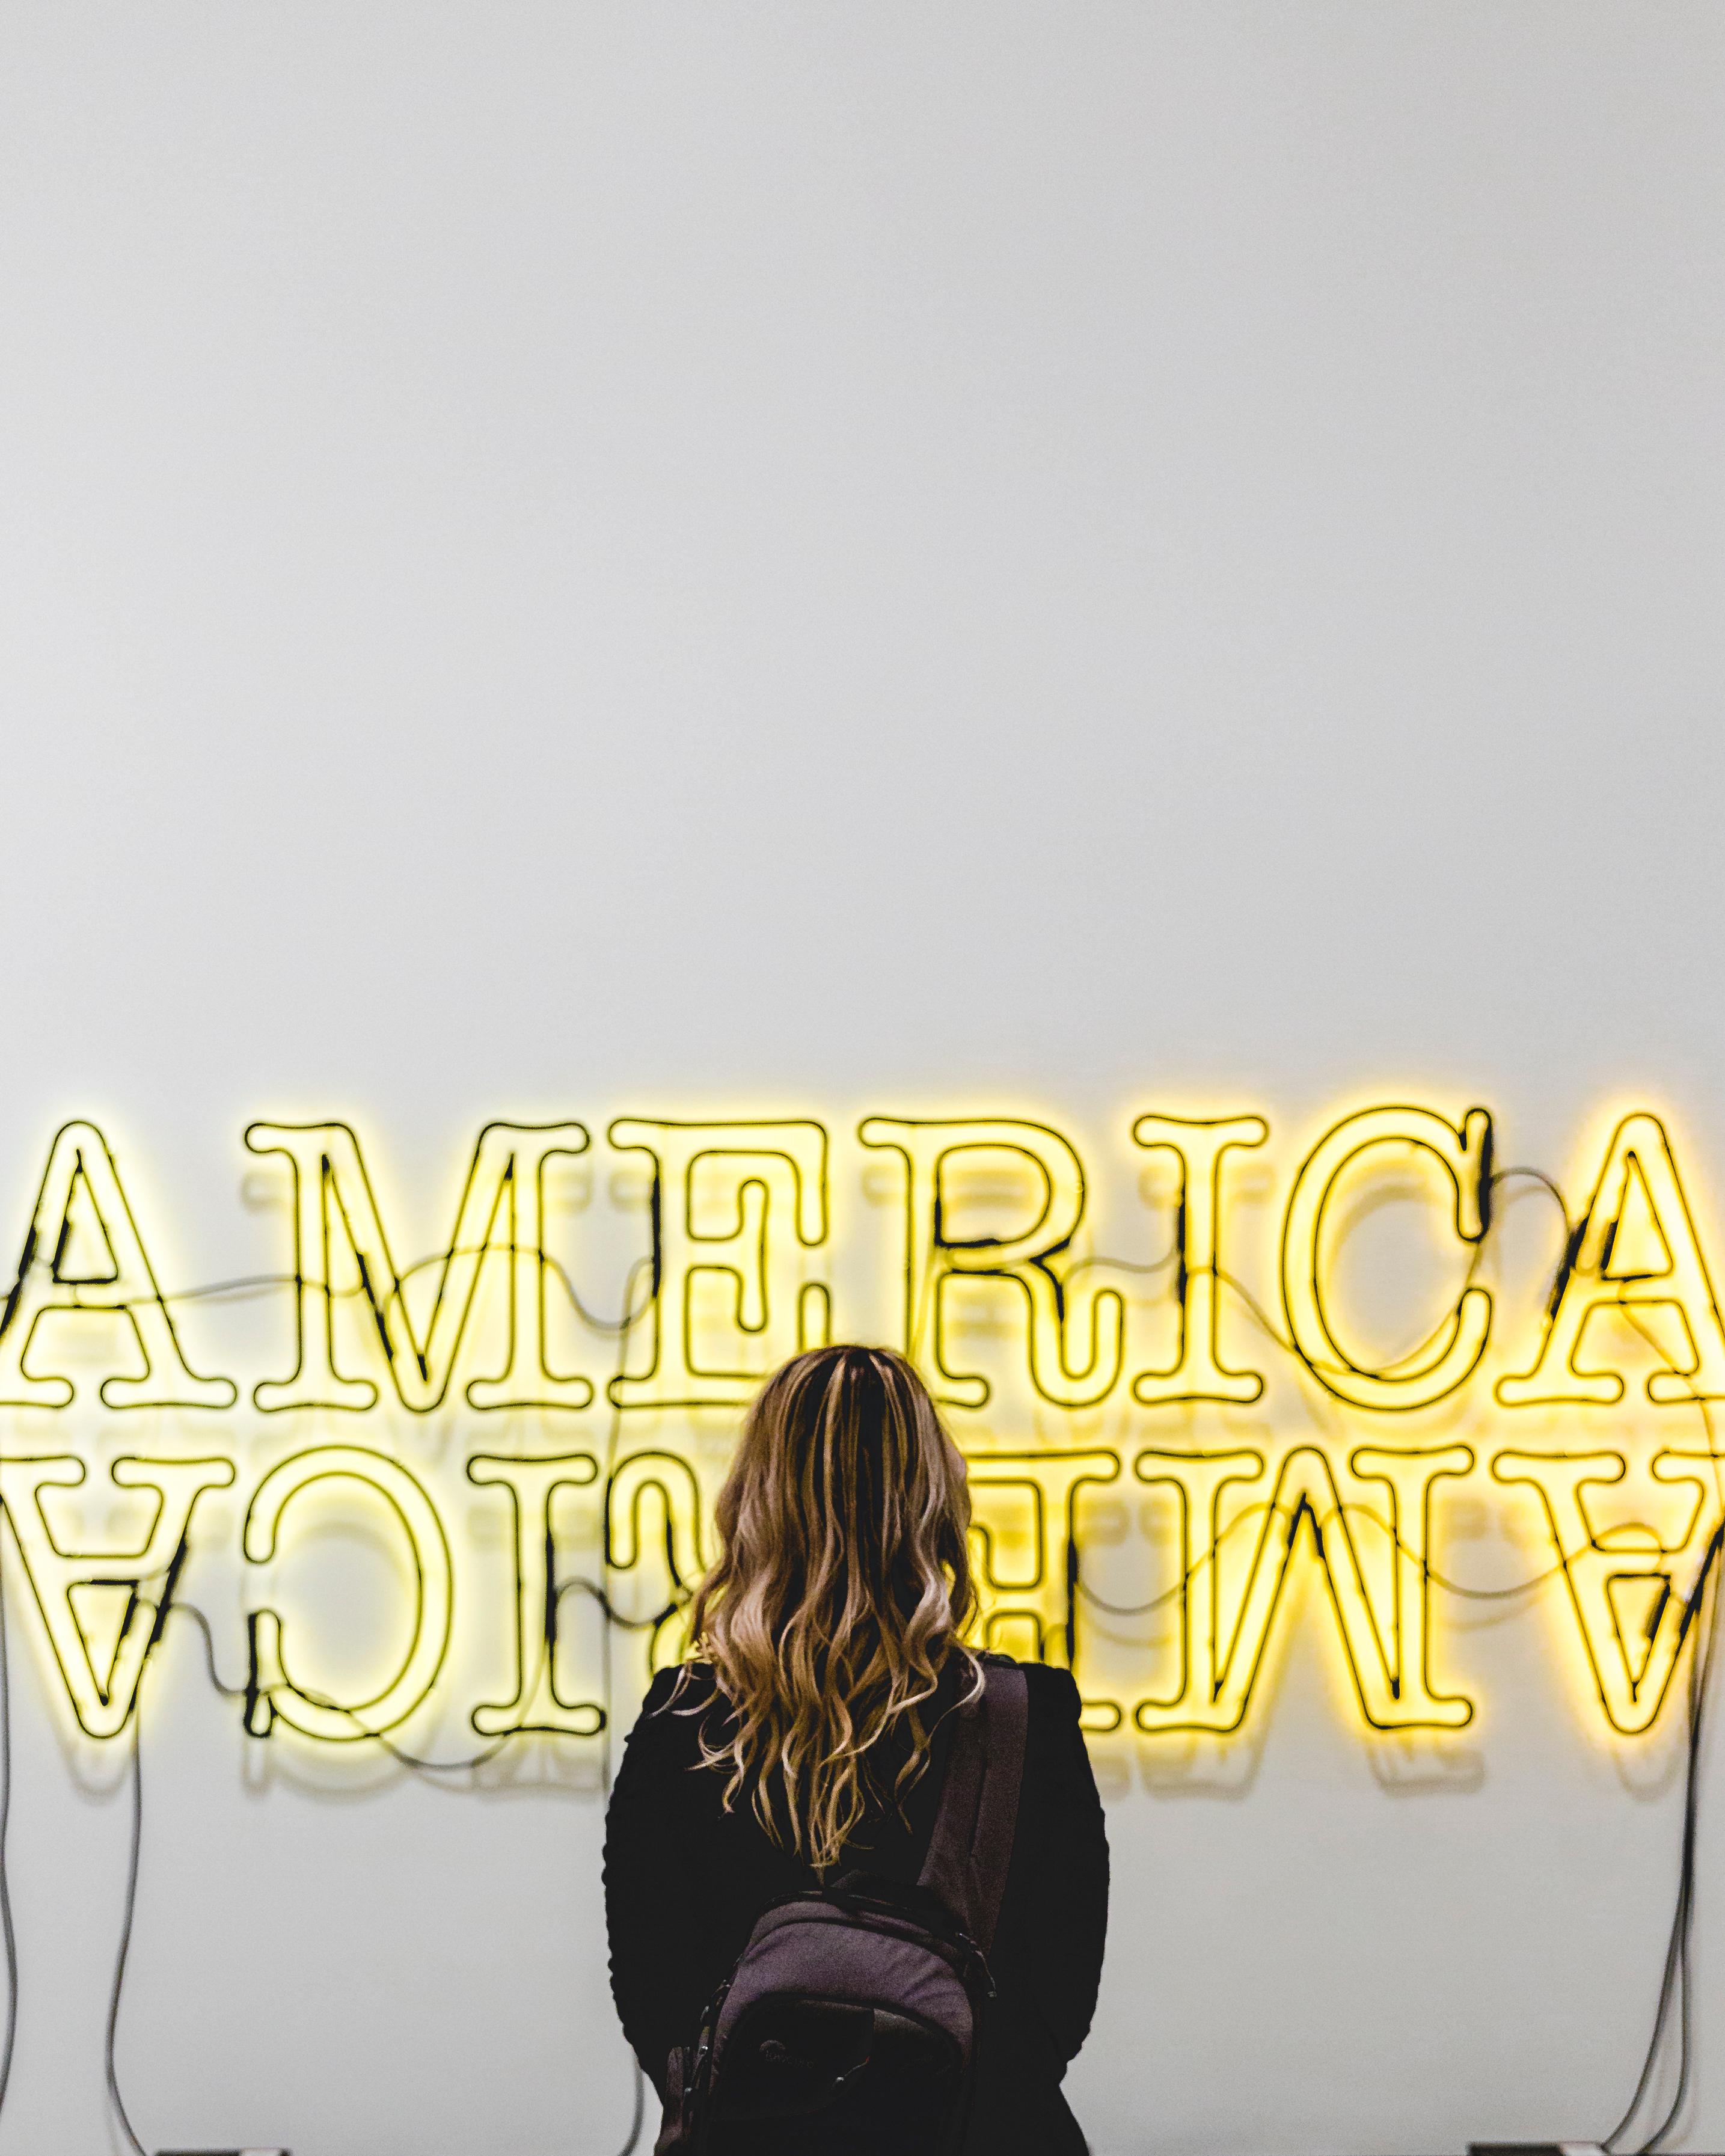 Gambar Wanita Iklan Tanda Amerika Kuning Neon Merek Fon